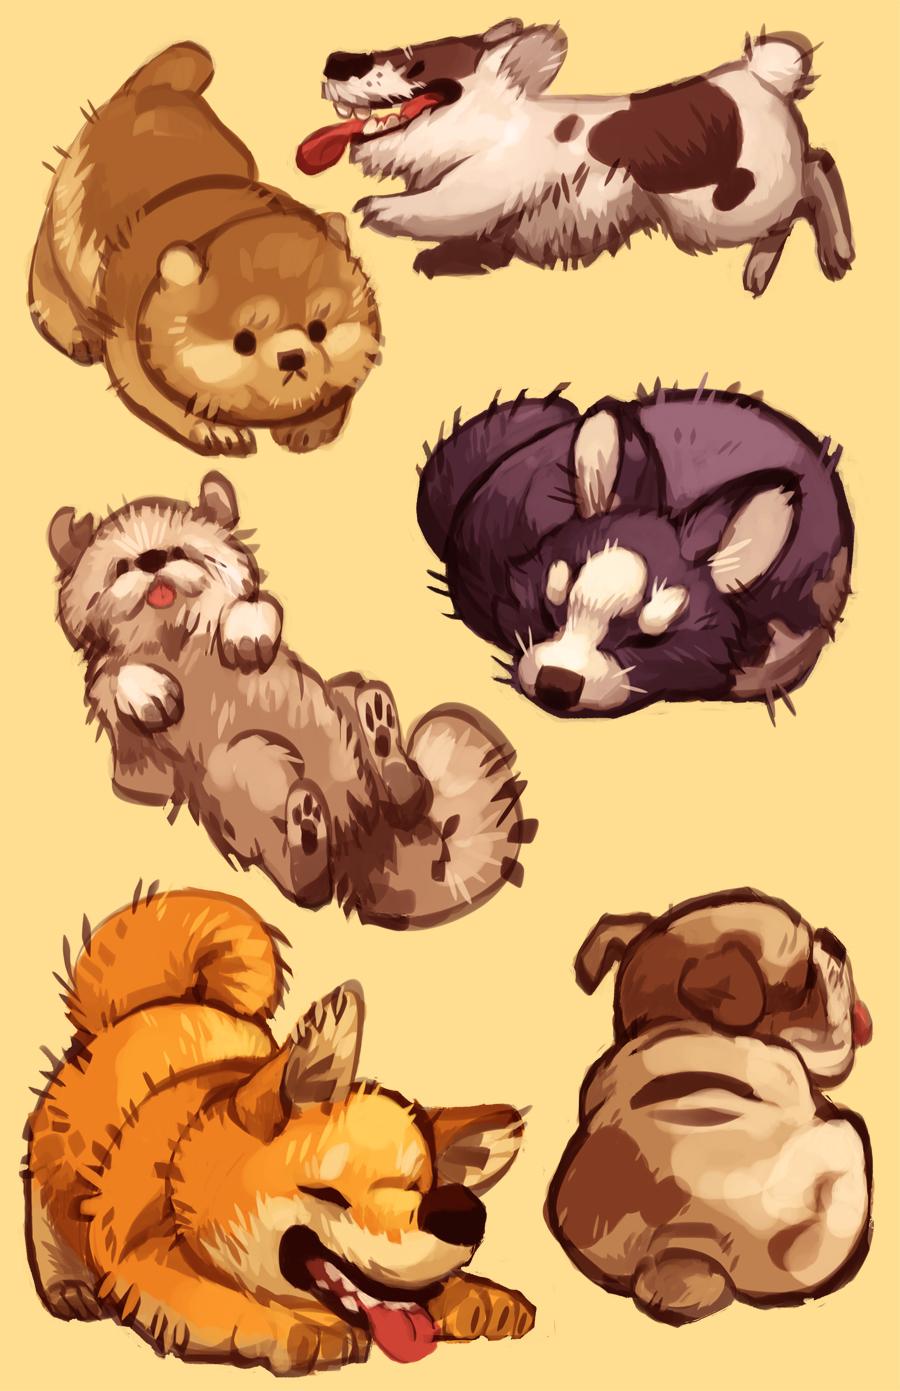 Drawn pug illustration tumblr In drawing load plumweed Nargyle@tumblr